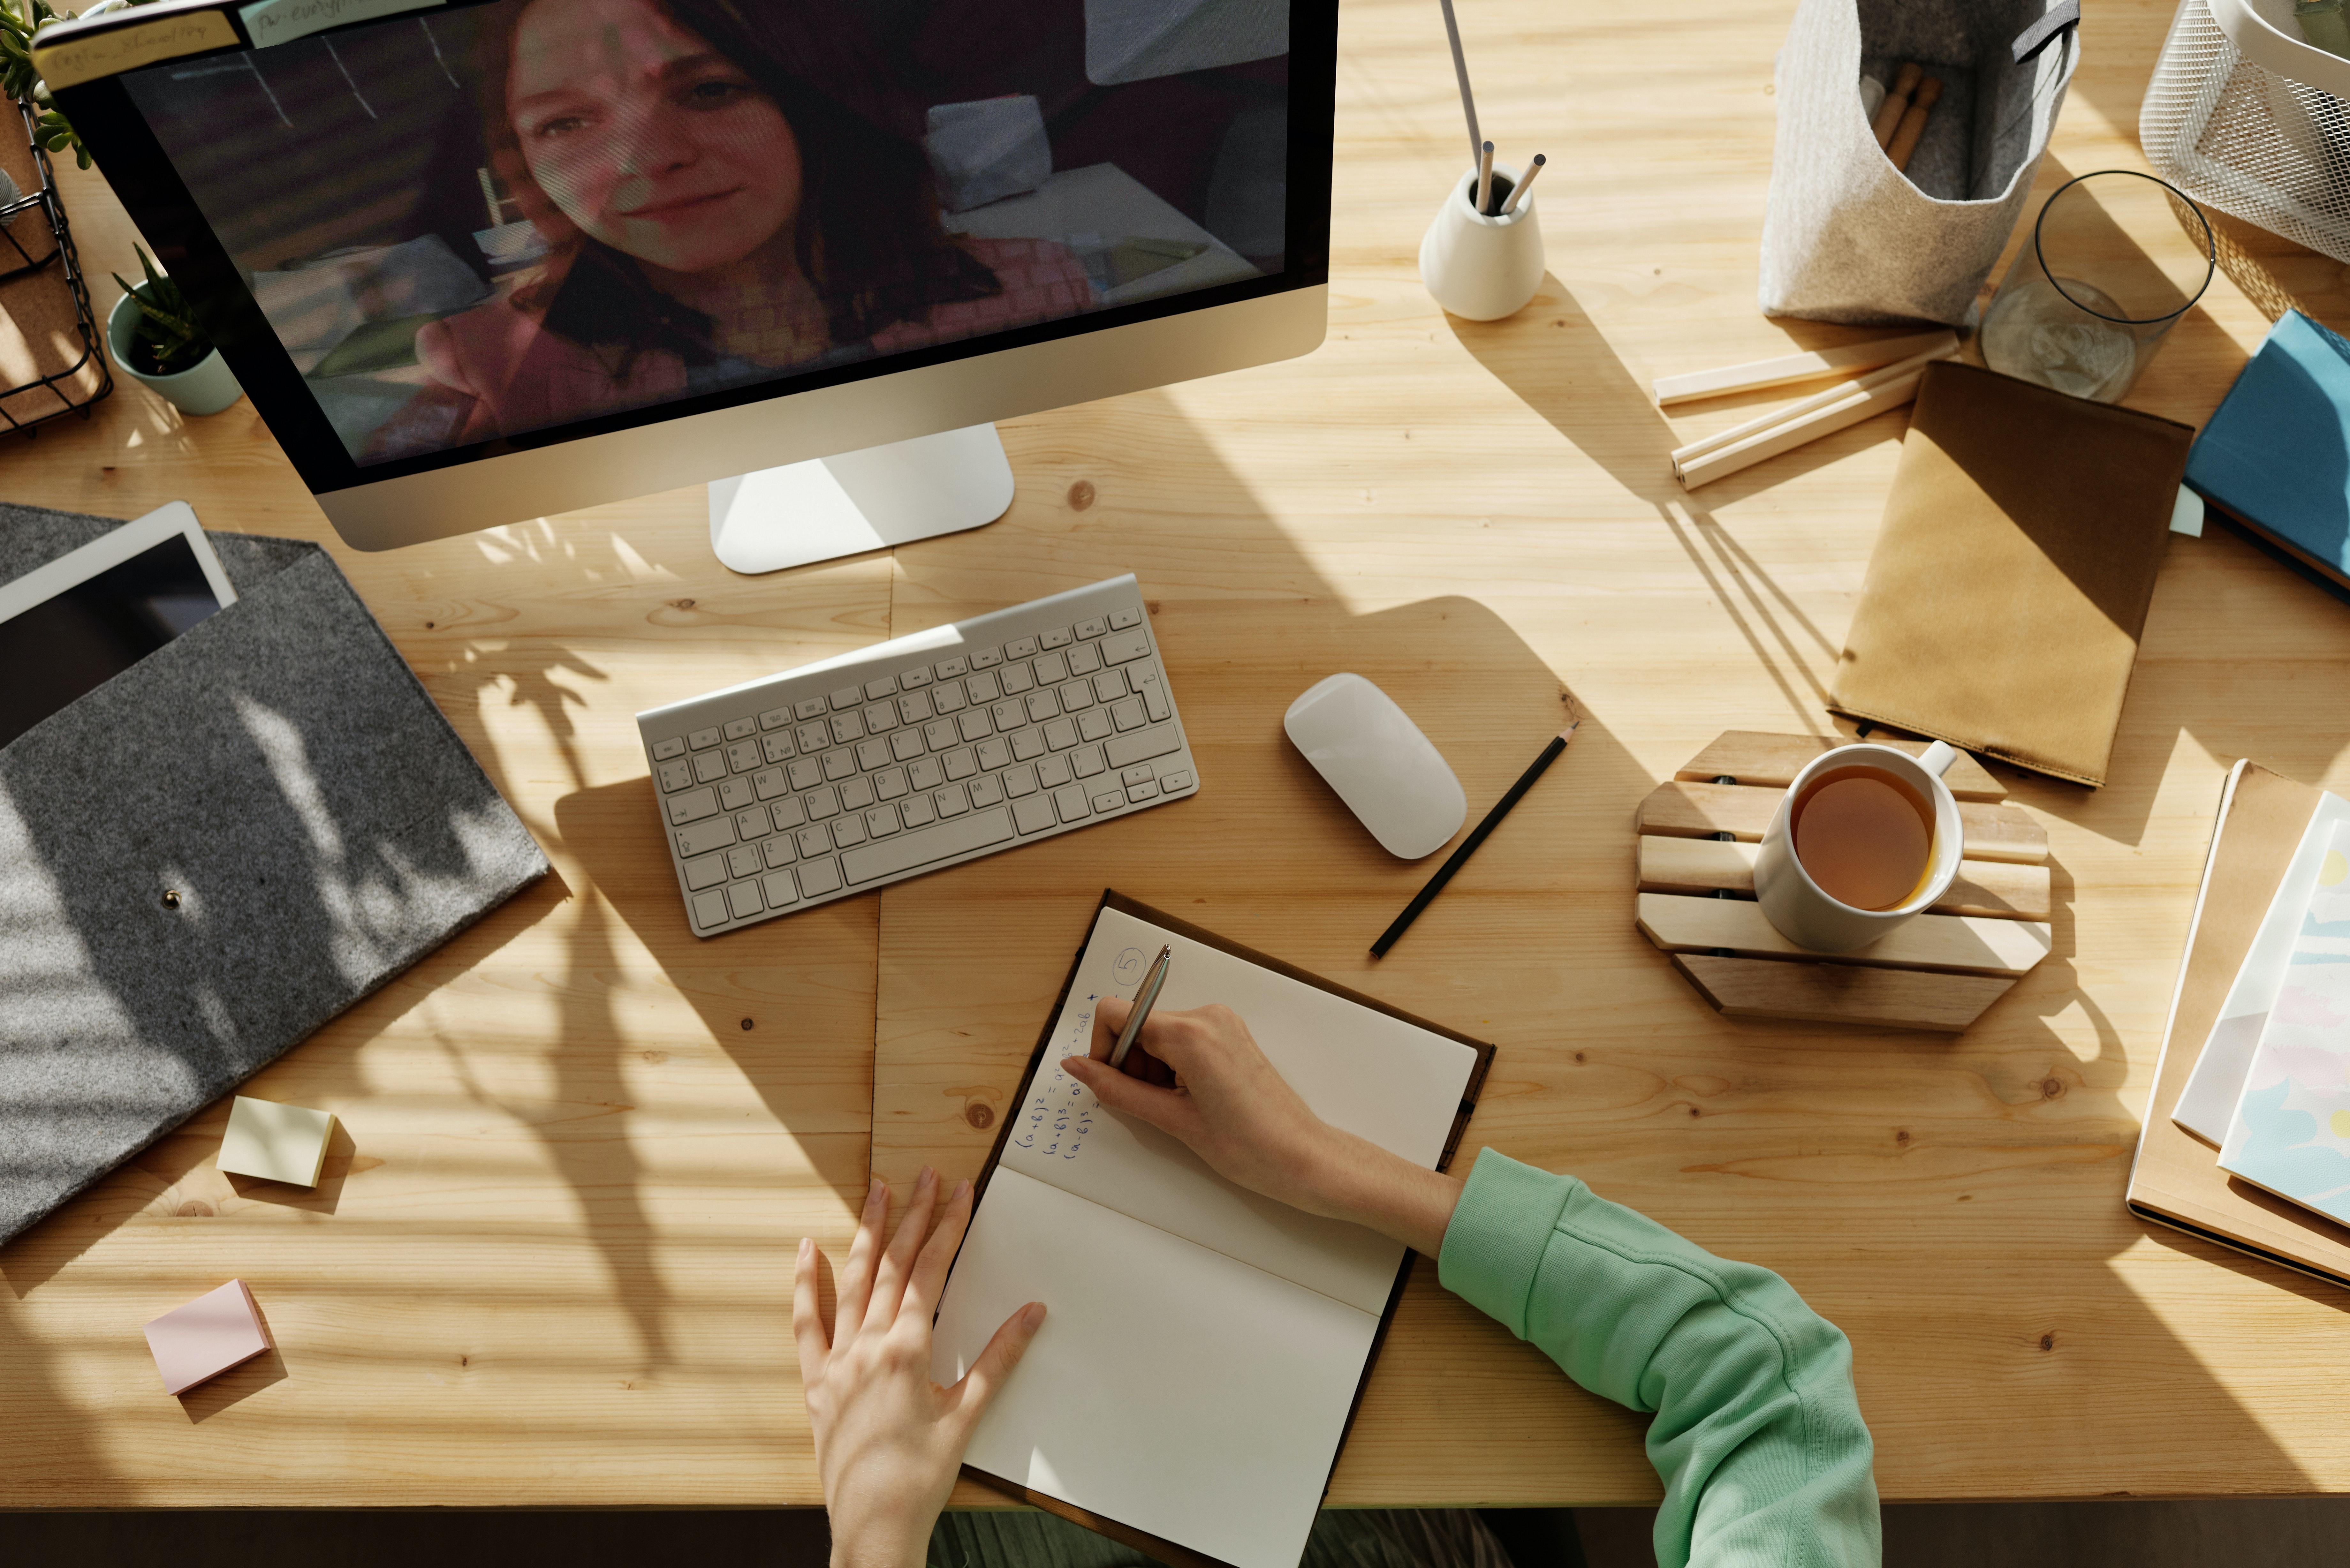 microsoft teams meetings tips work from home desk computer